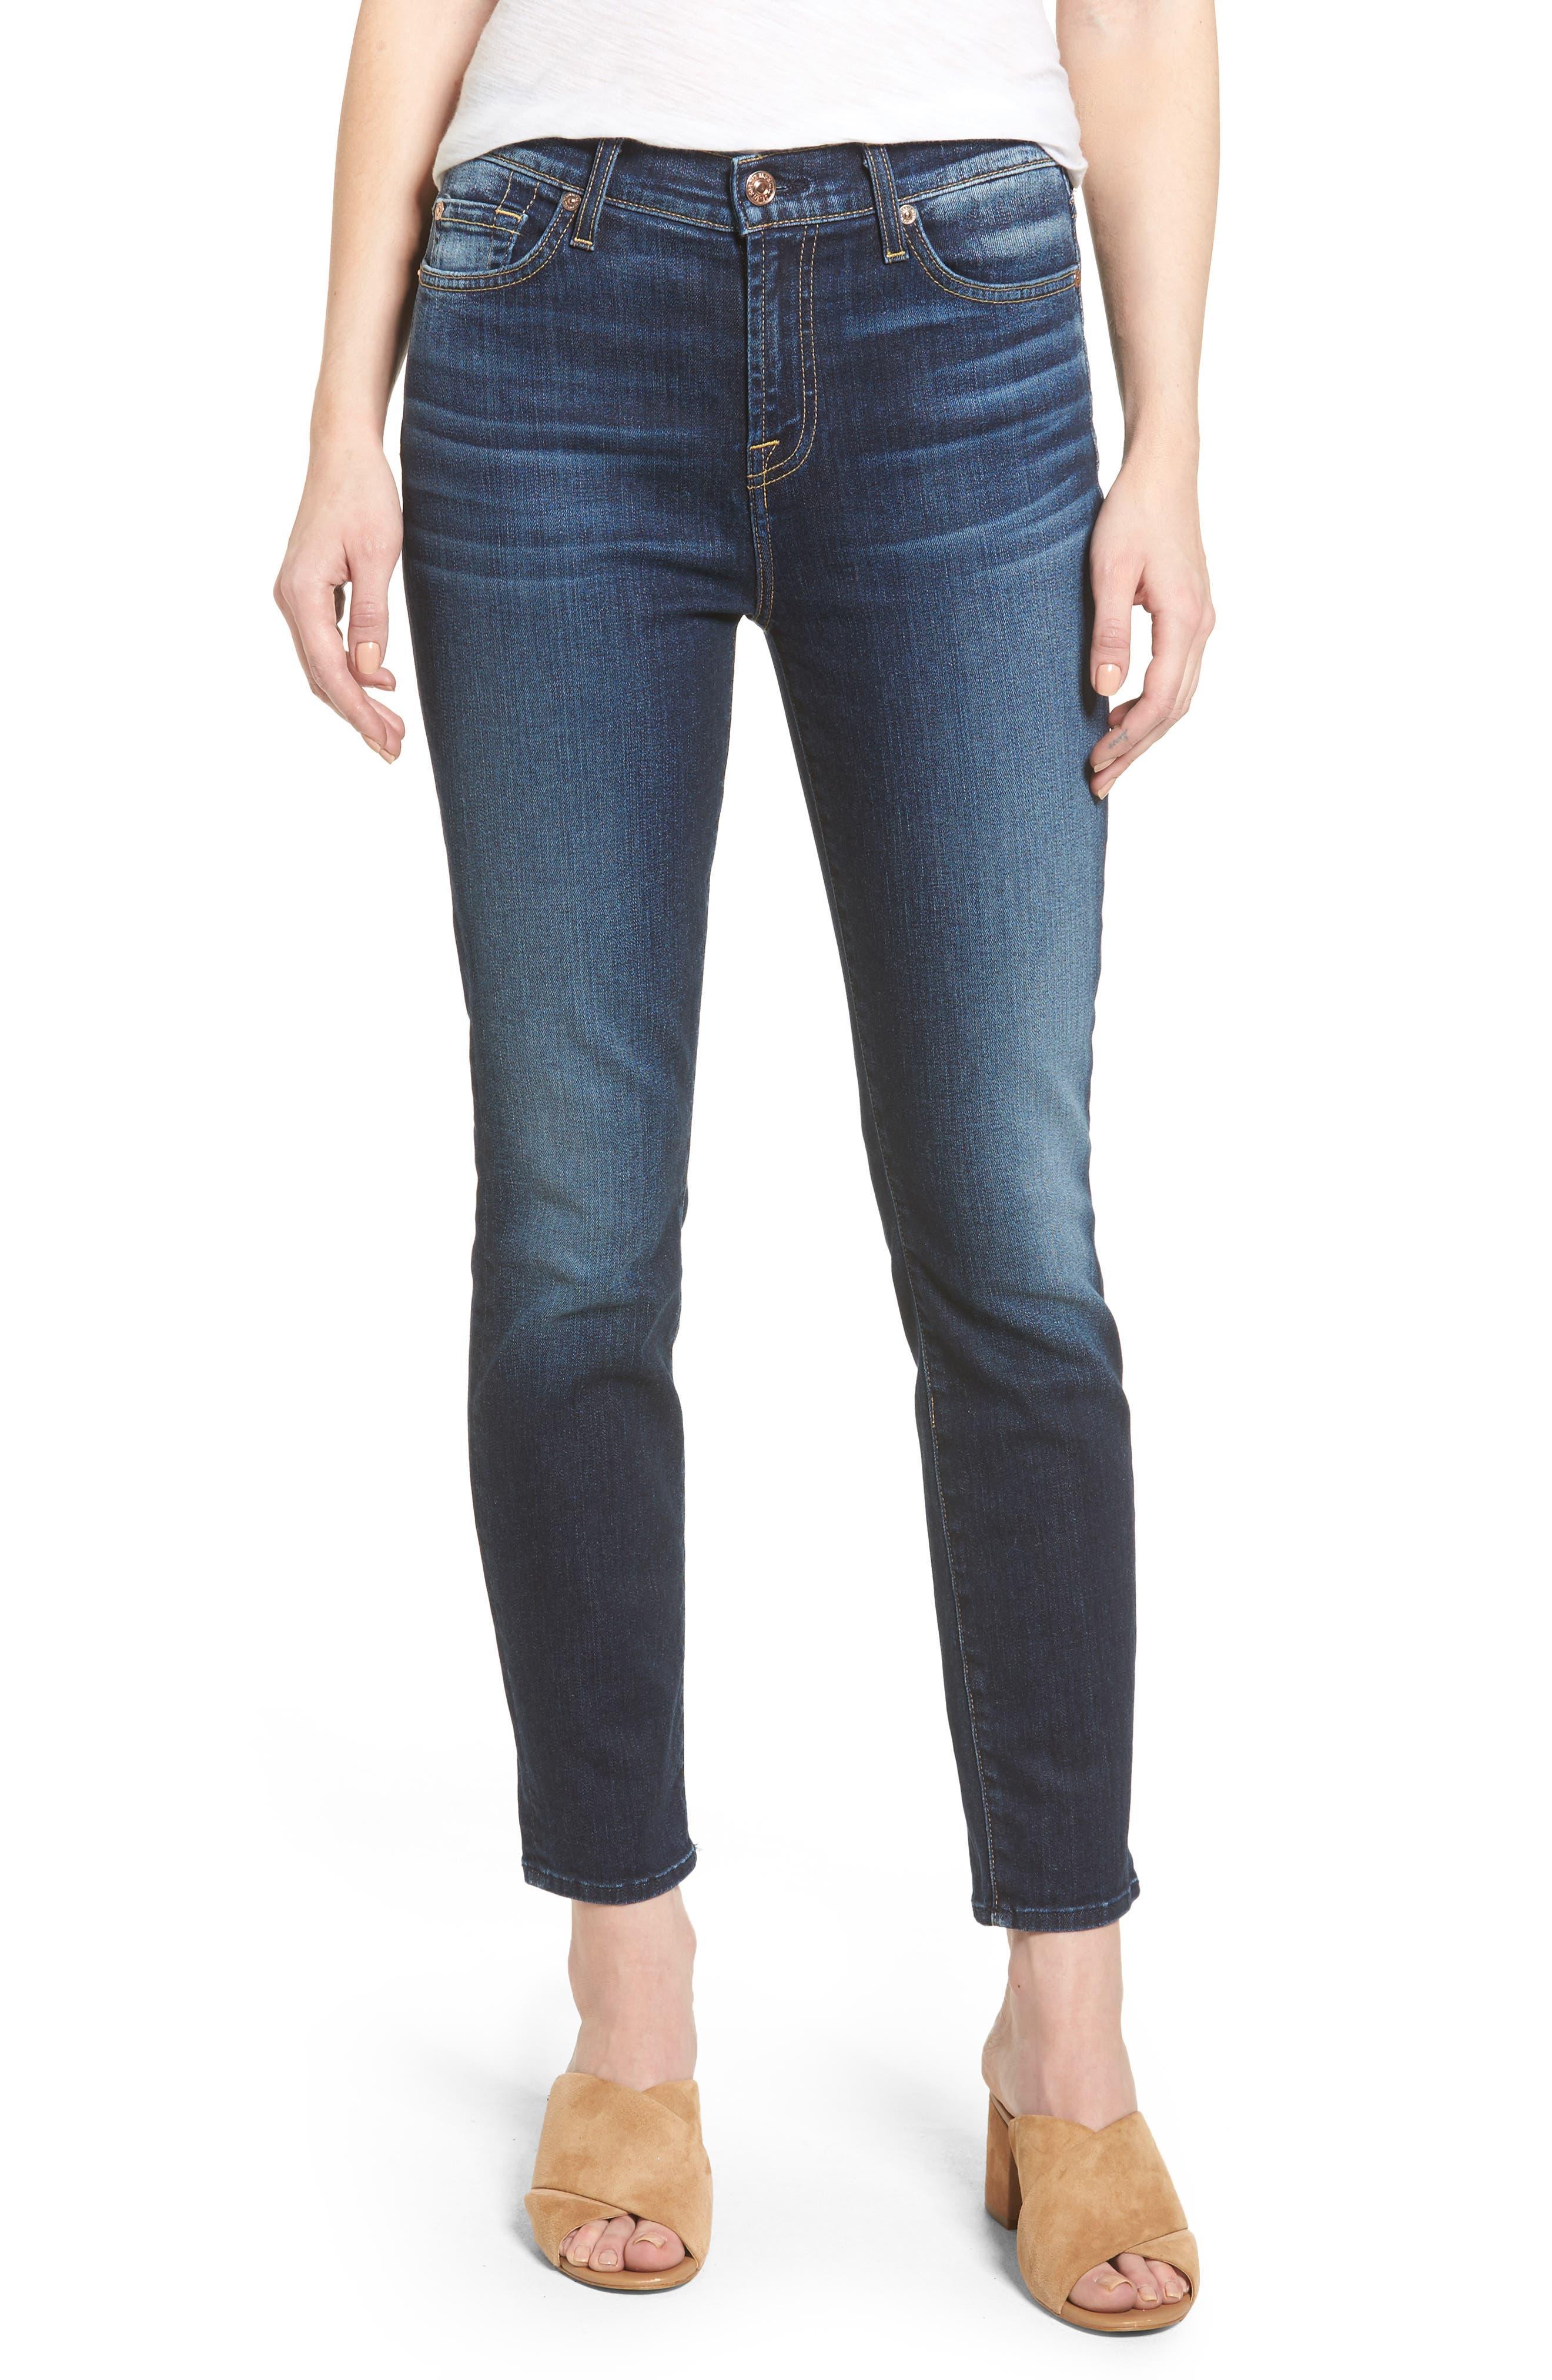 Seven7 Roxanne High Waist Ankle Jeans,                             Main thumbnail 1, color,                             401